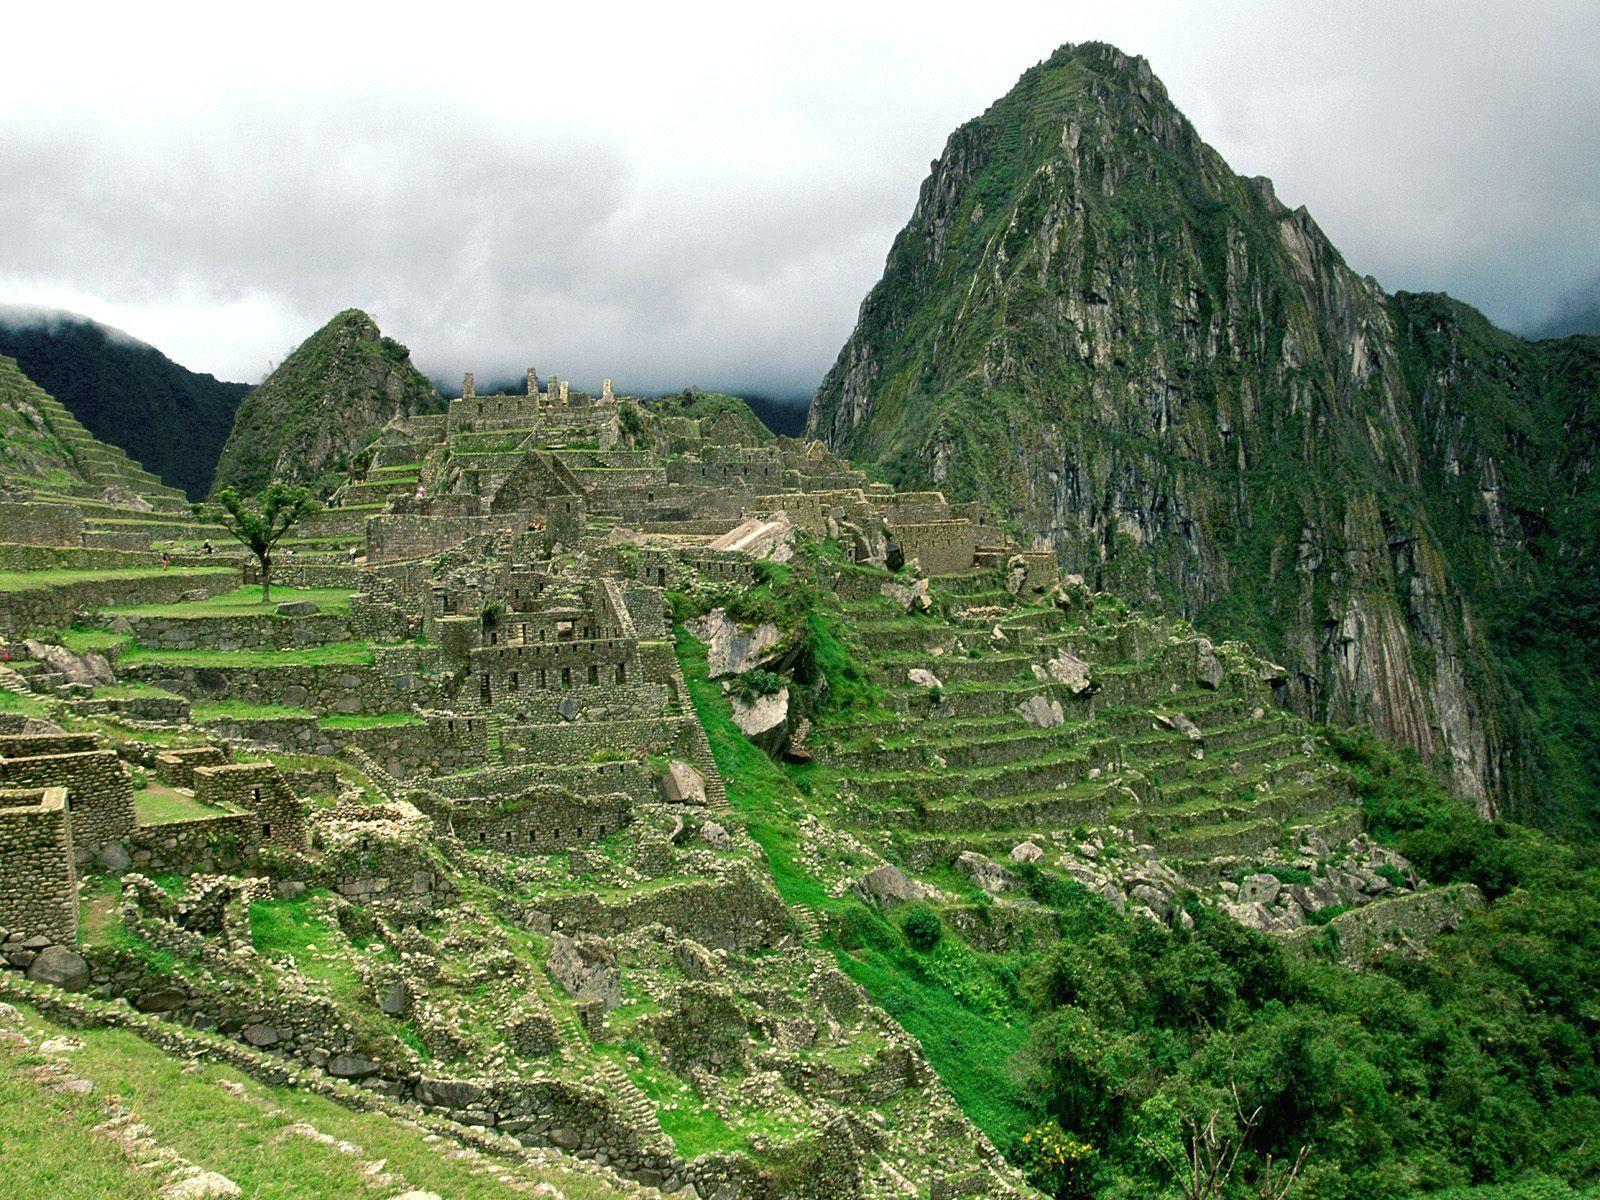 Solo fondos de pantalla paisajes lugares so ados for Fondos de pantalla 7 maravillas del mundo